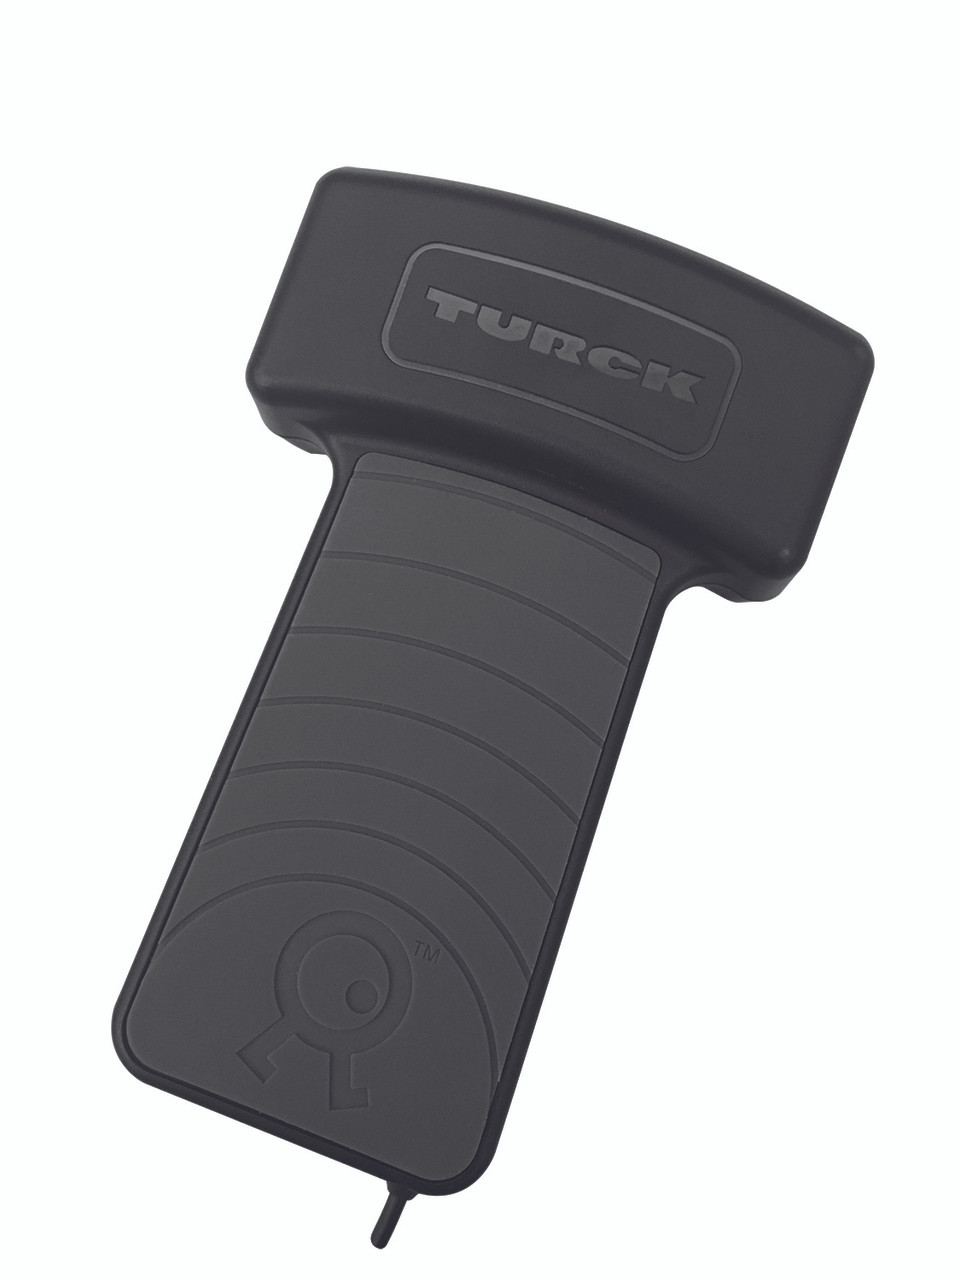 TURCK (U Grok It) UHF RFID Reader for Smartphones